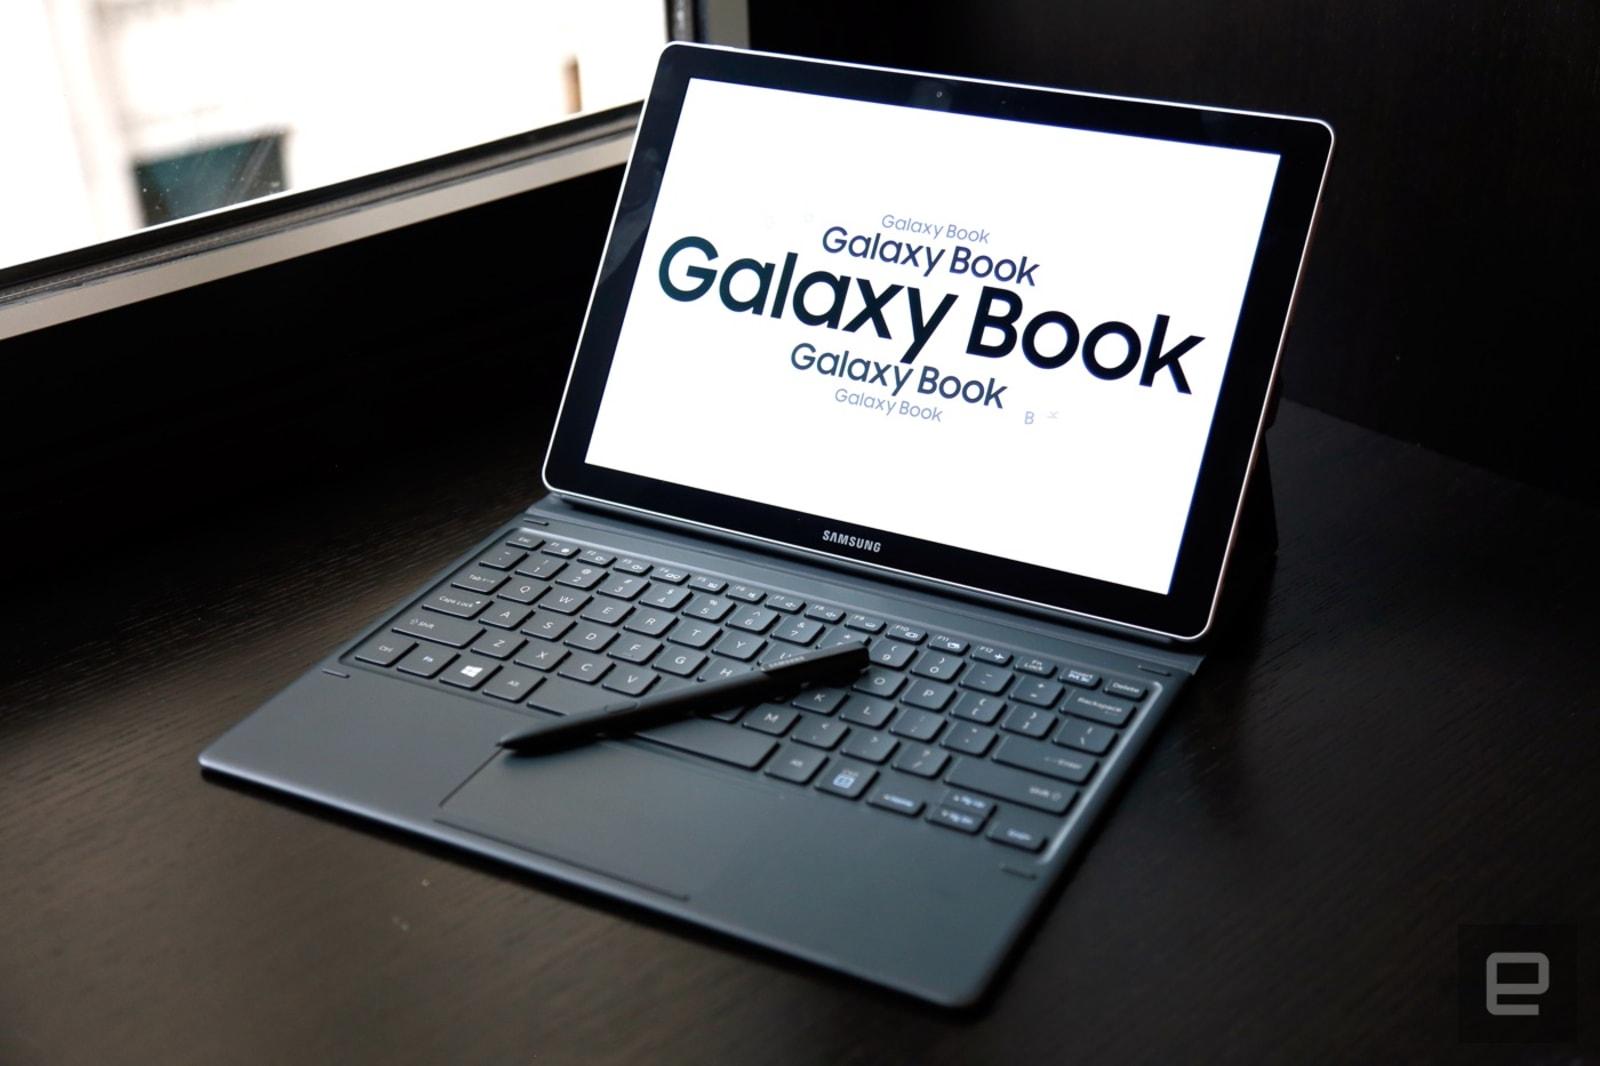 samsung 39 s galaxy book crams desktop power in portable body. Black Bedroom Furniture Sets. Home Design Ideas